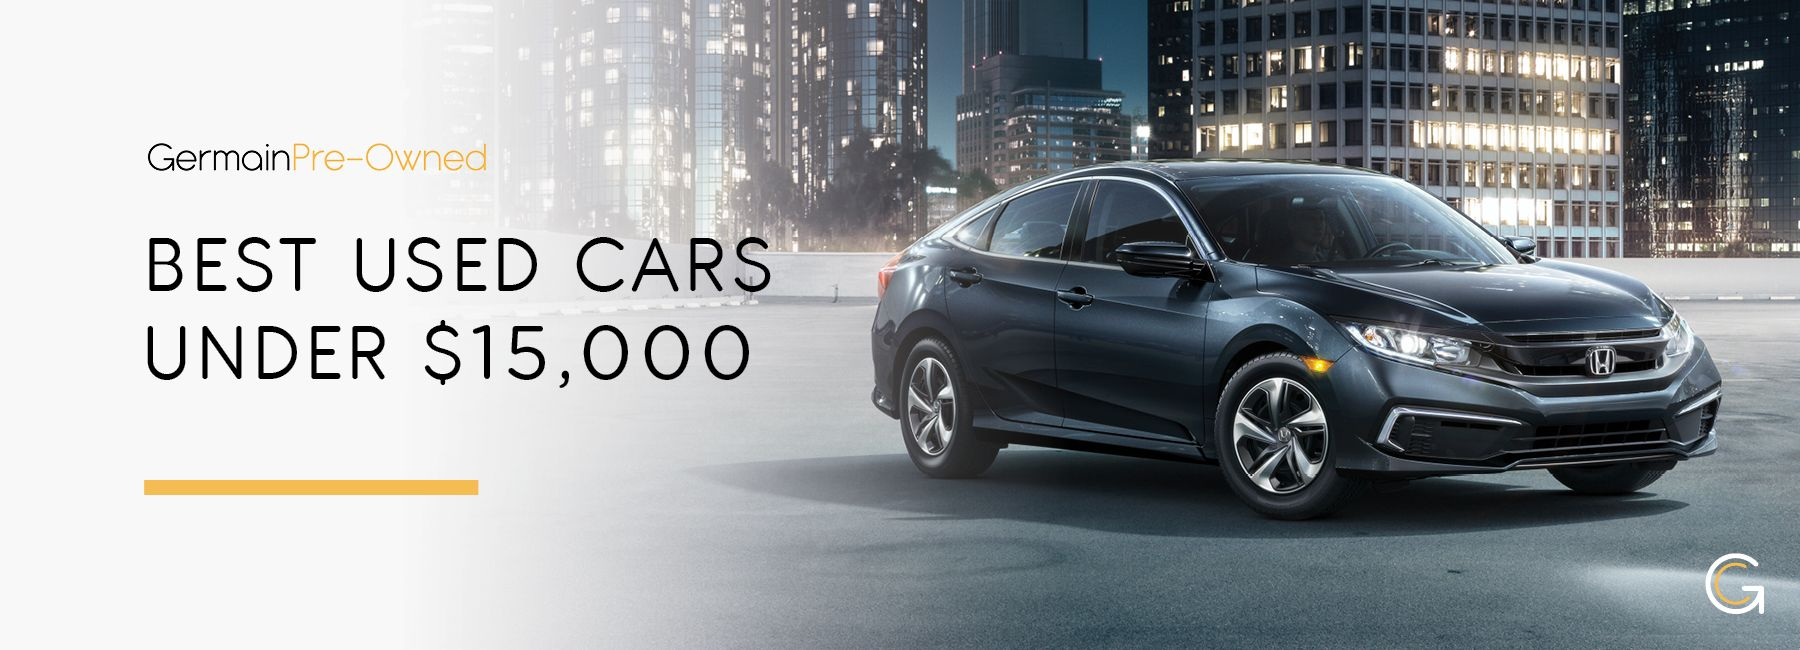 Best Used Cars Under $15,000 – Germain Cars